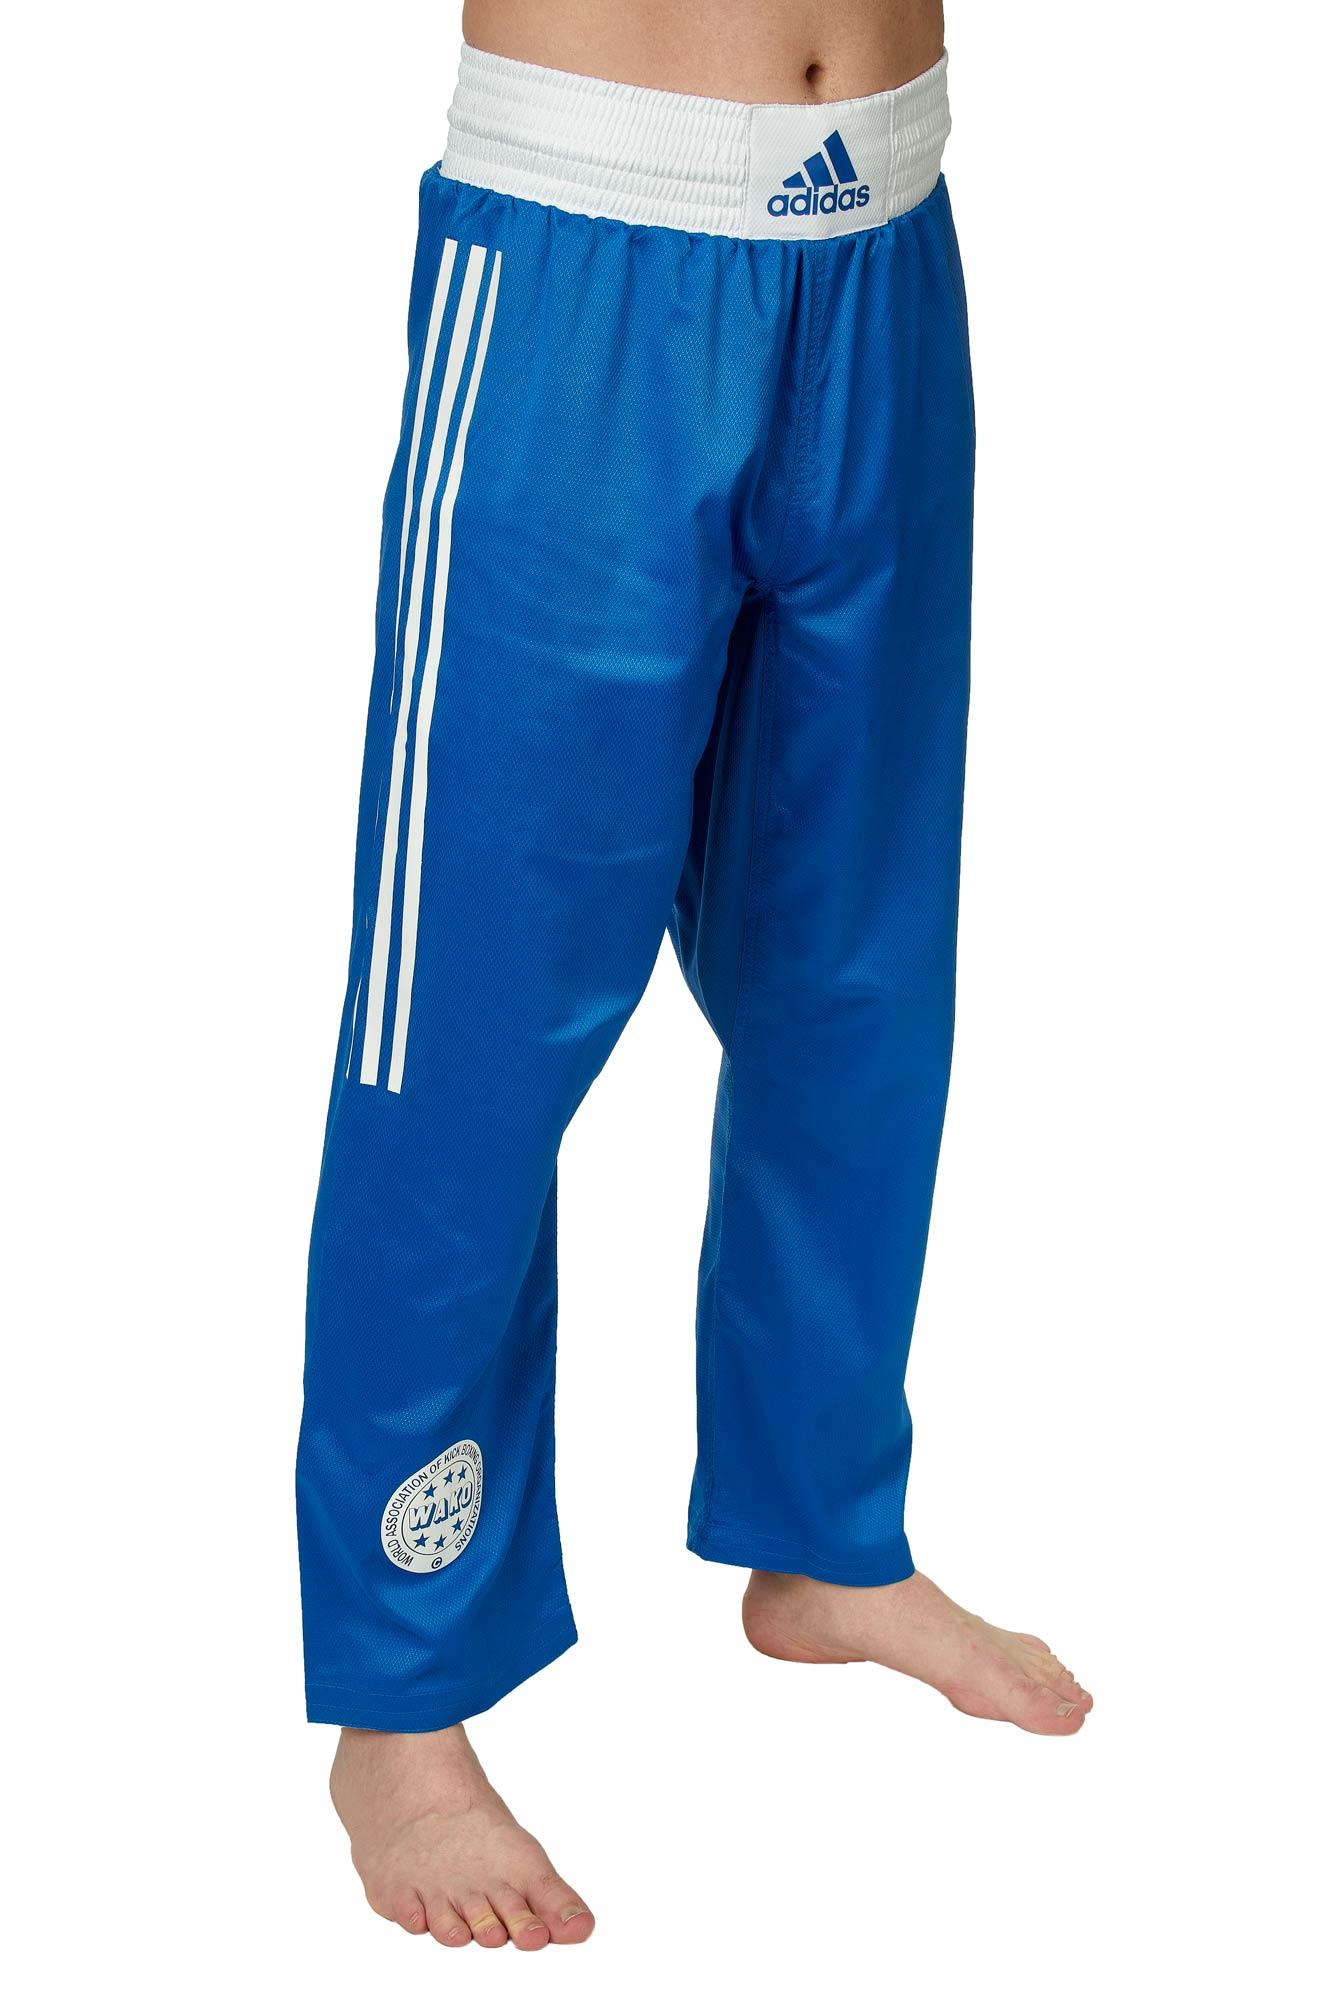 Diamond Full Pants Micro Contact BlueAdifcp1 Adidas 7g6IyvYbf